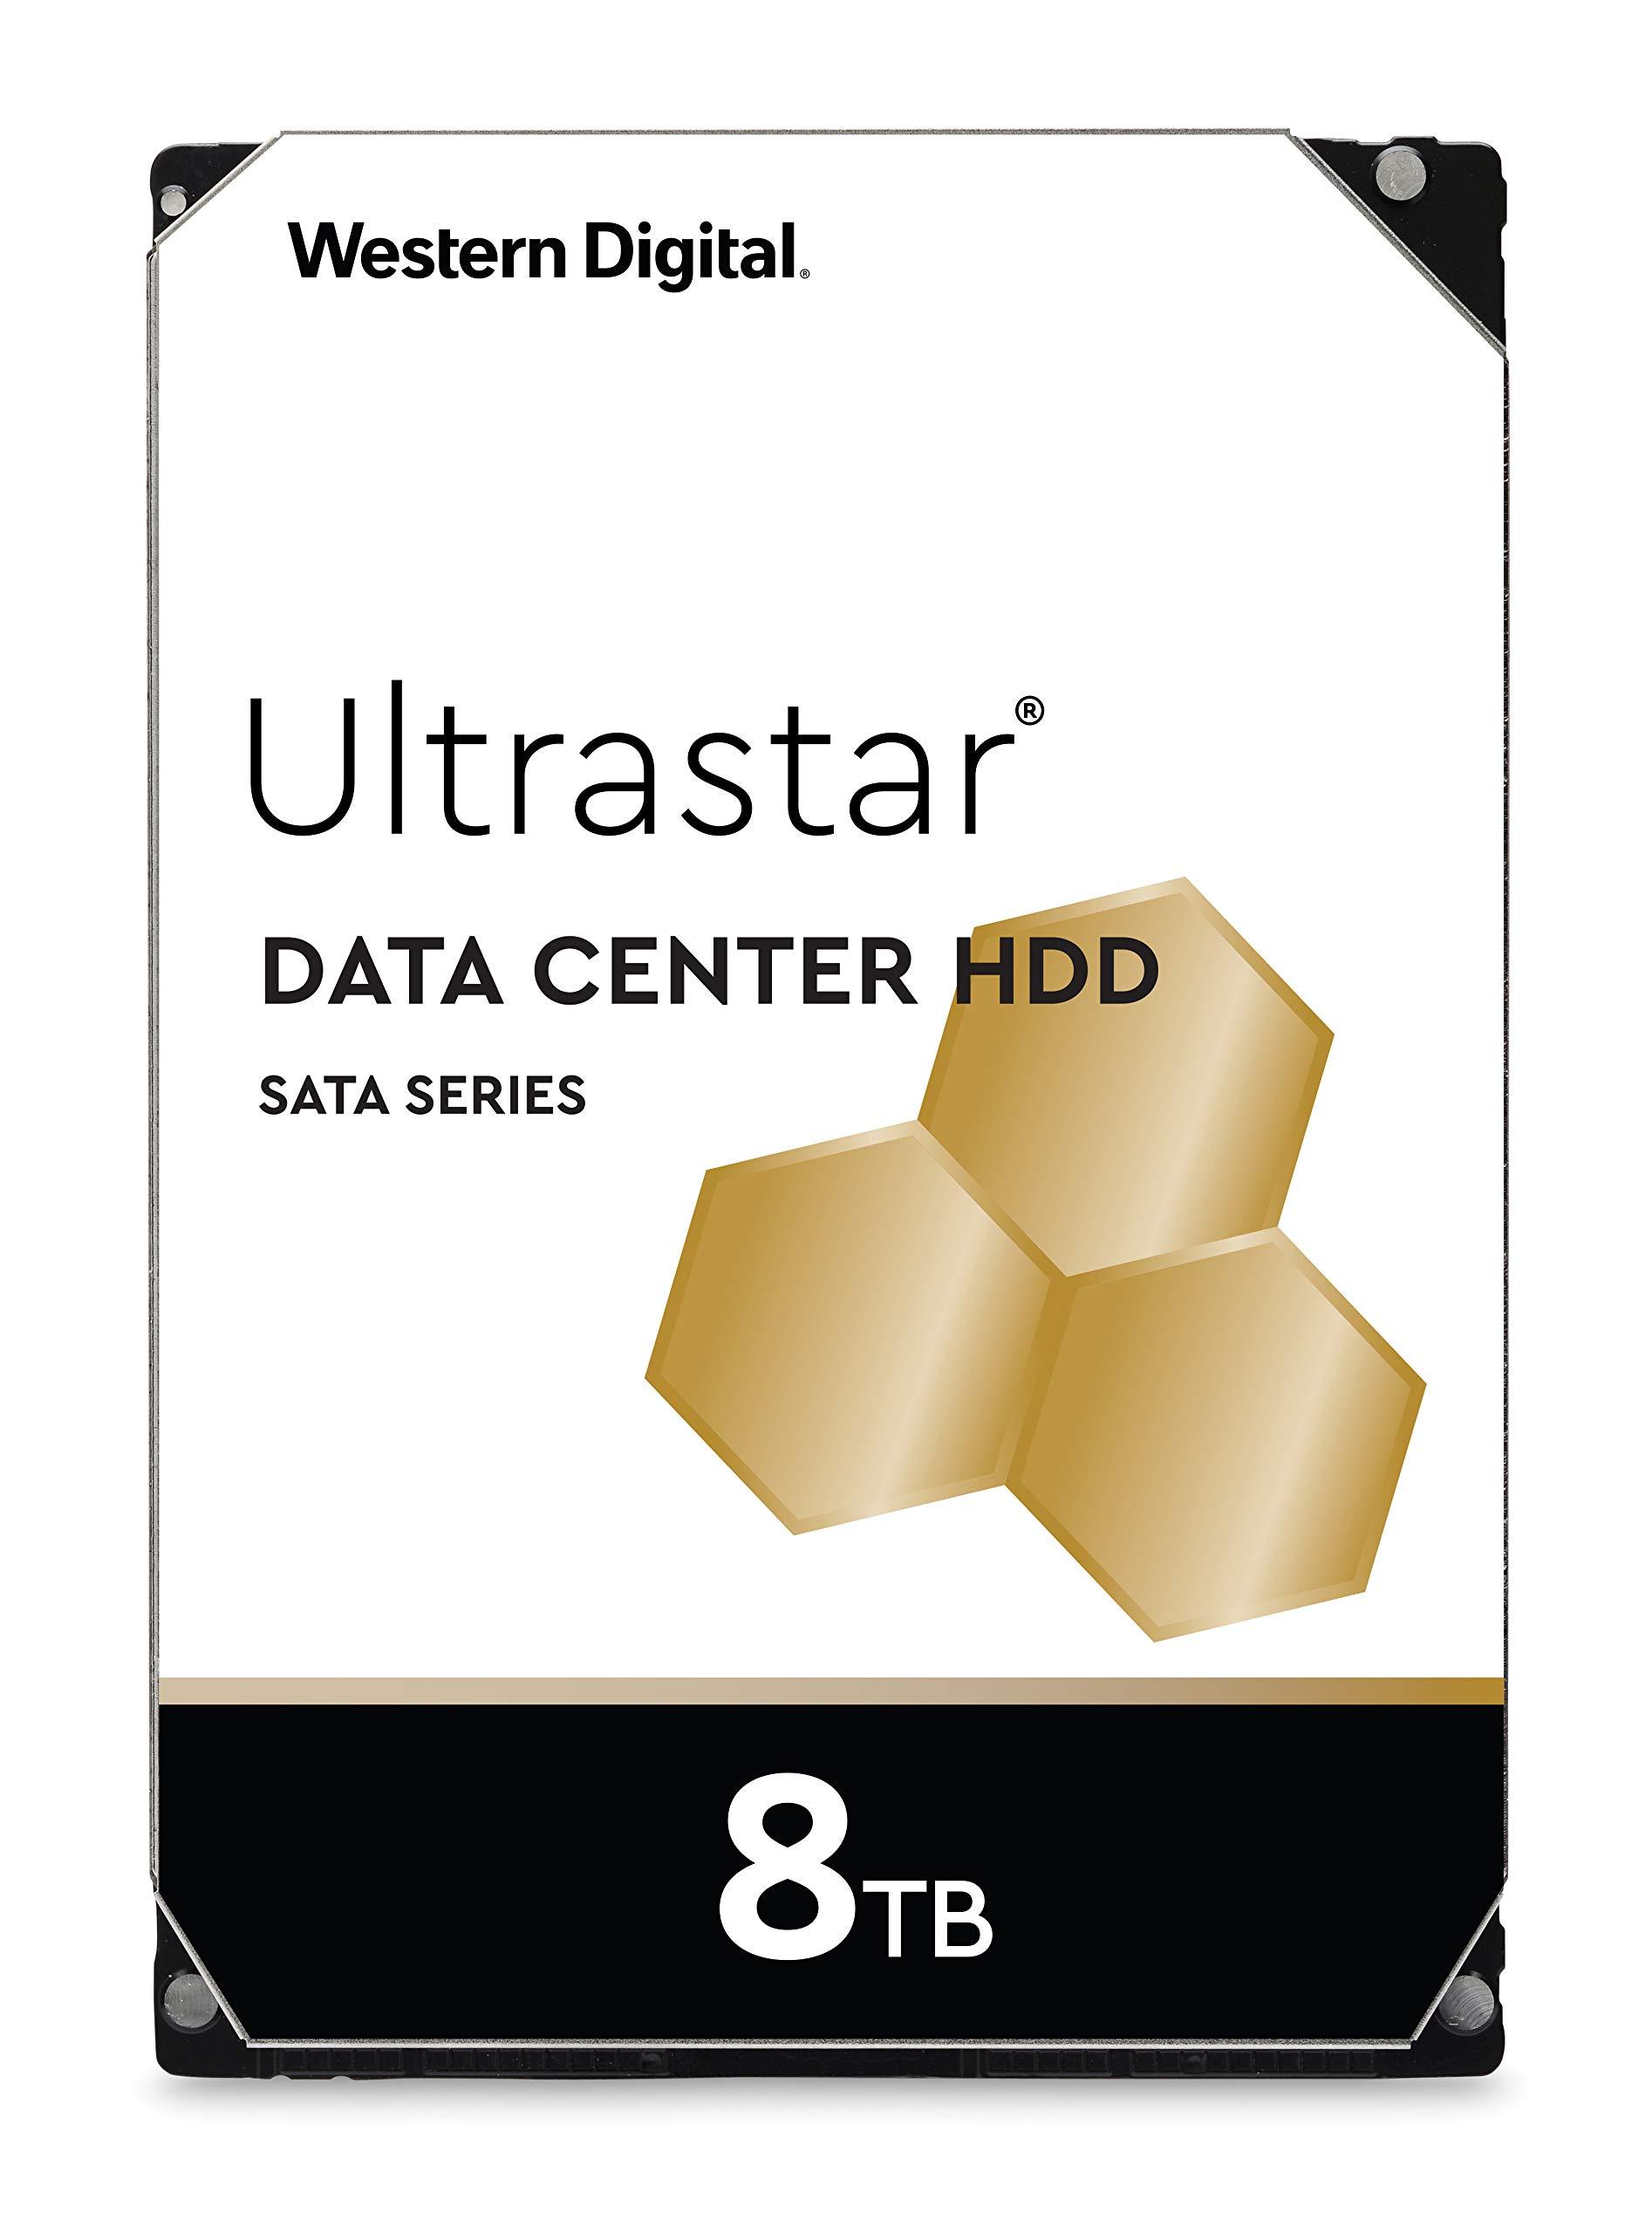 Western Digital Ultrastar DC HC320 HDD | HUS728T8TALE6L4 | 0B36404 | 8TB 7200RPM 256MB Cache SATA 6Gb/s 3.5'' Inch | 512e | SE - Secure Erase | Enterprise Hard Disk Drive